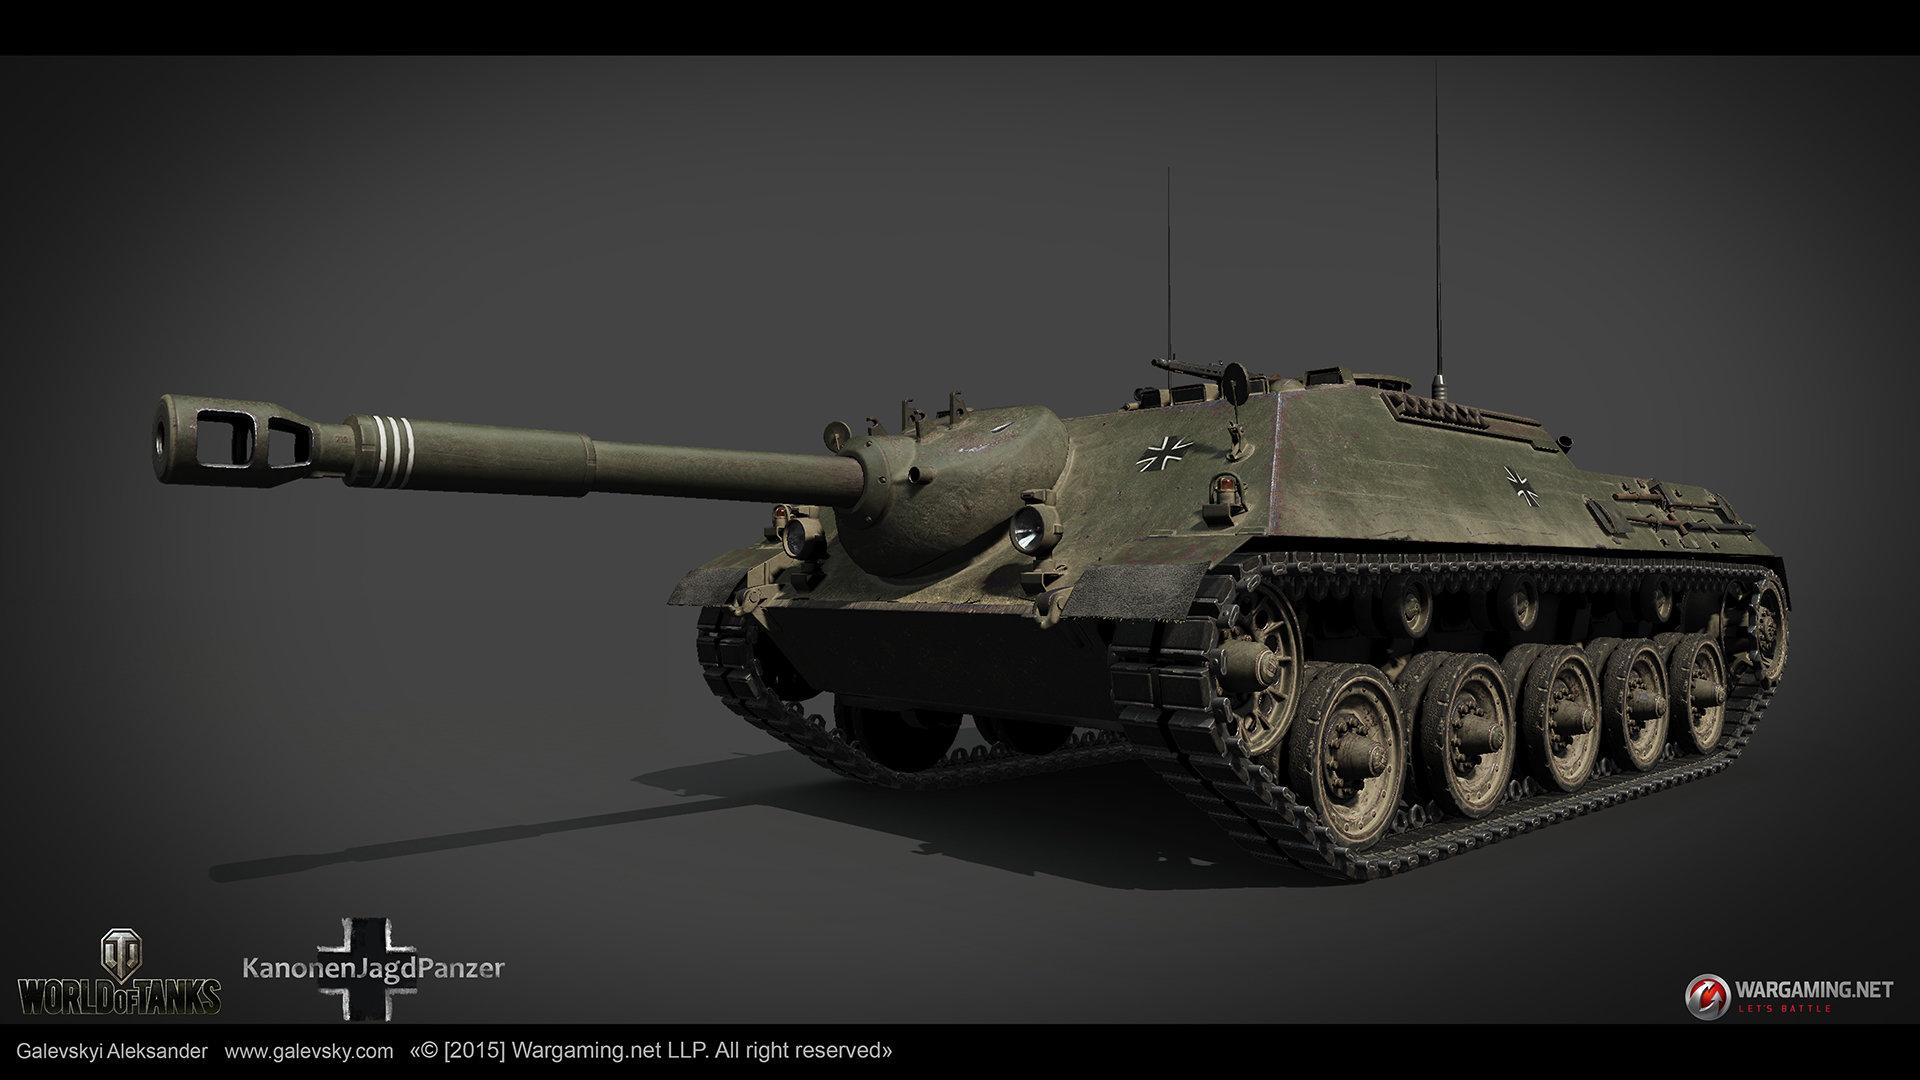 Aleksander galevskyi kanonenjagdpanzer fin small 06